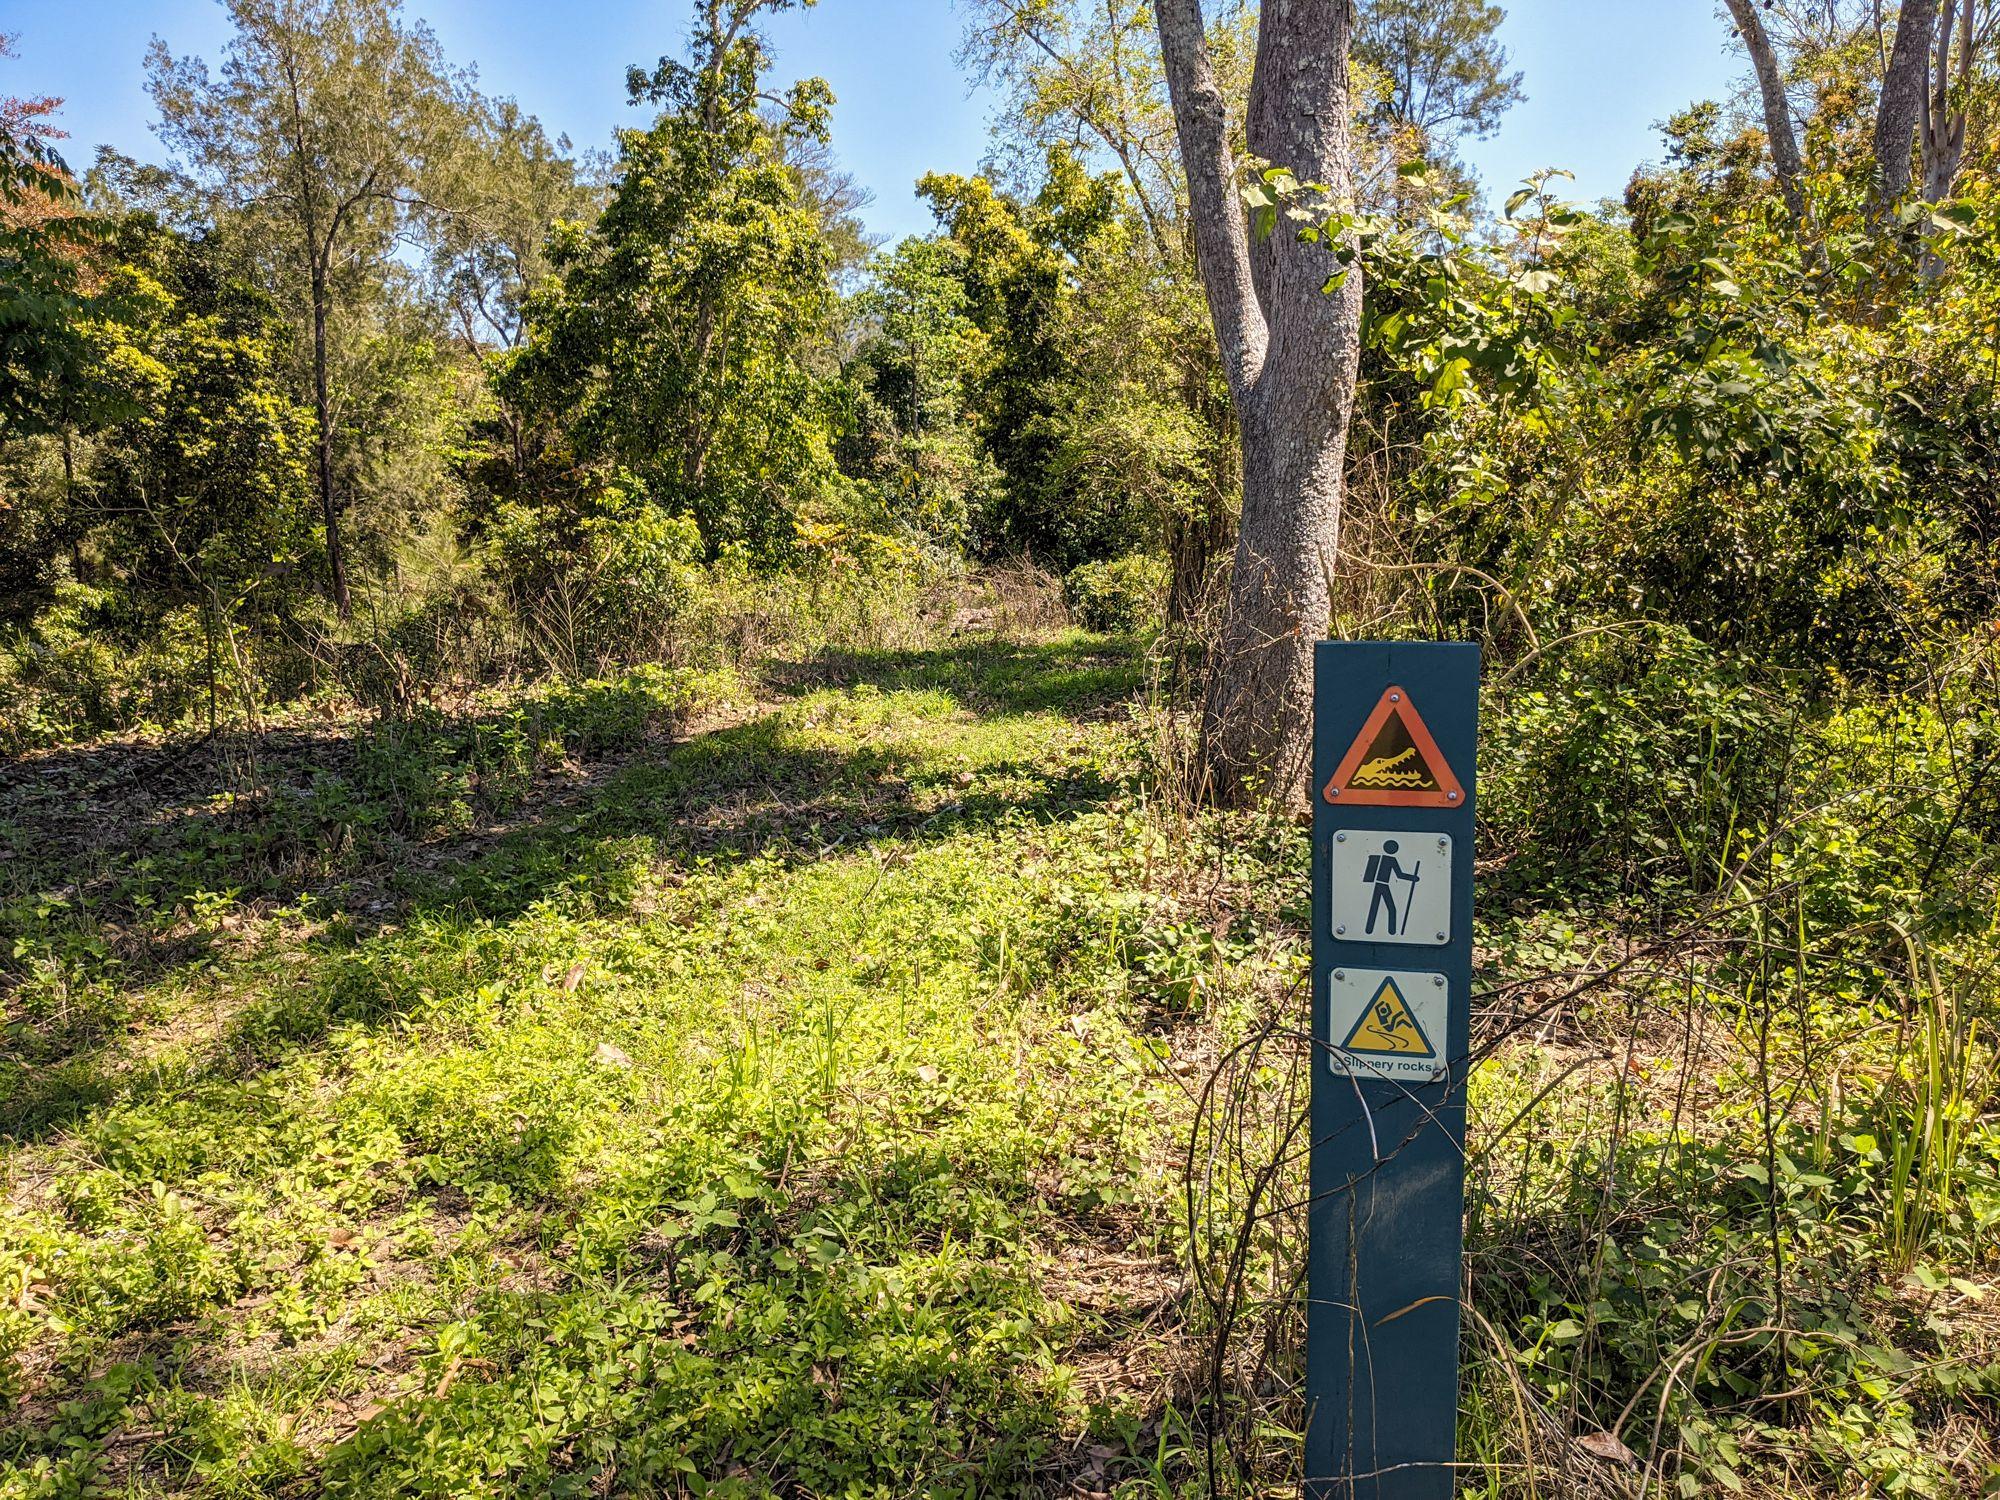 Henrietta track signpost